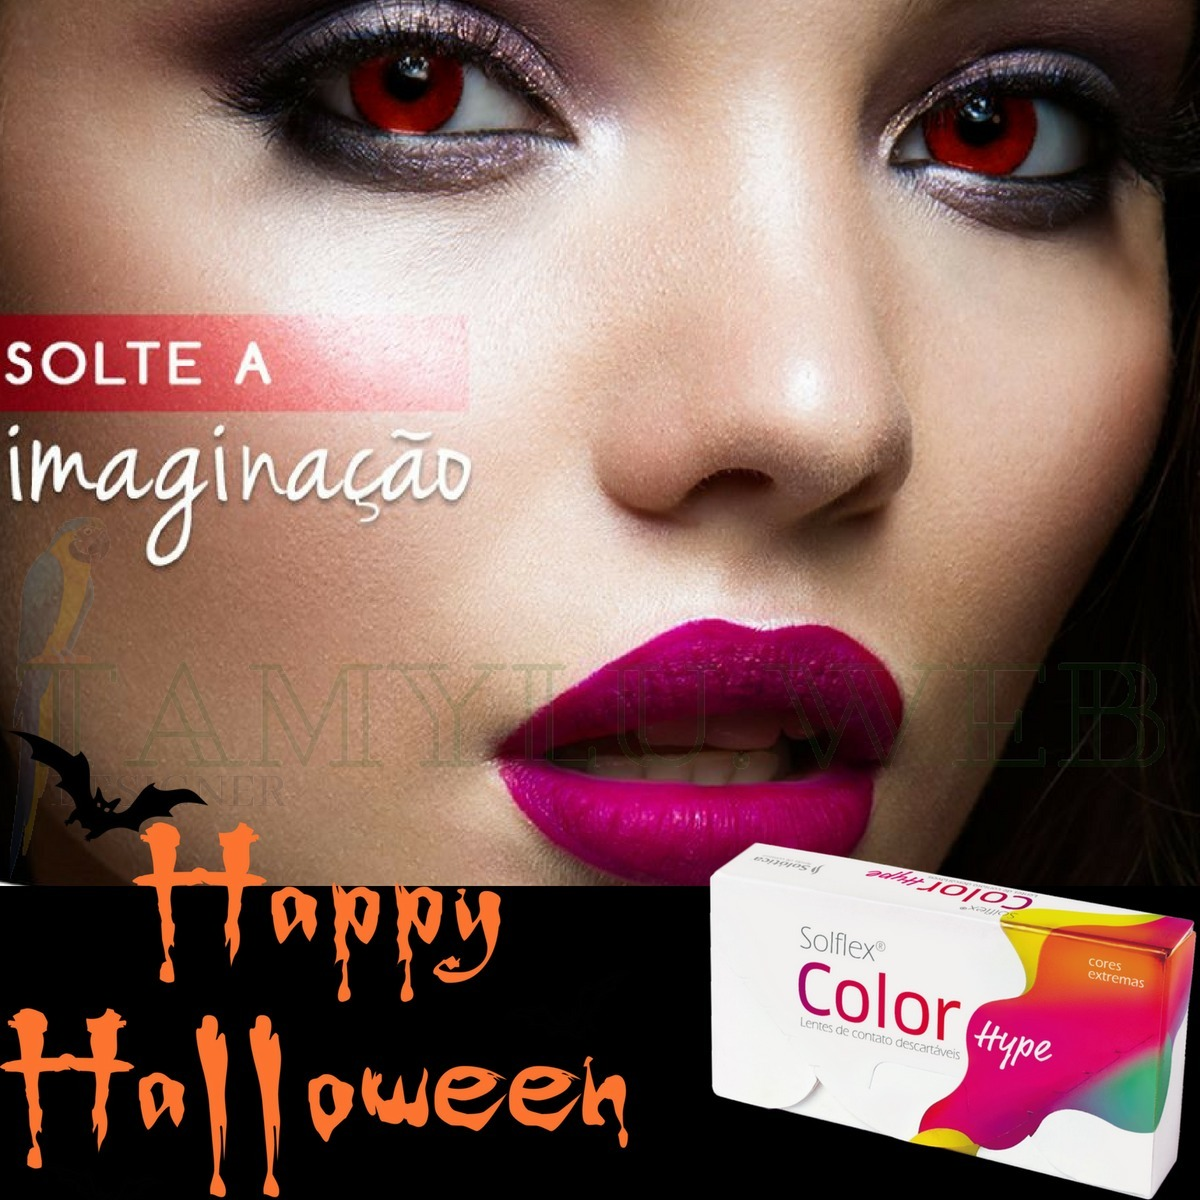 42ede701c4493 lentes de contato cosplay color hype halloween. Carregando zoom.